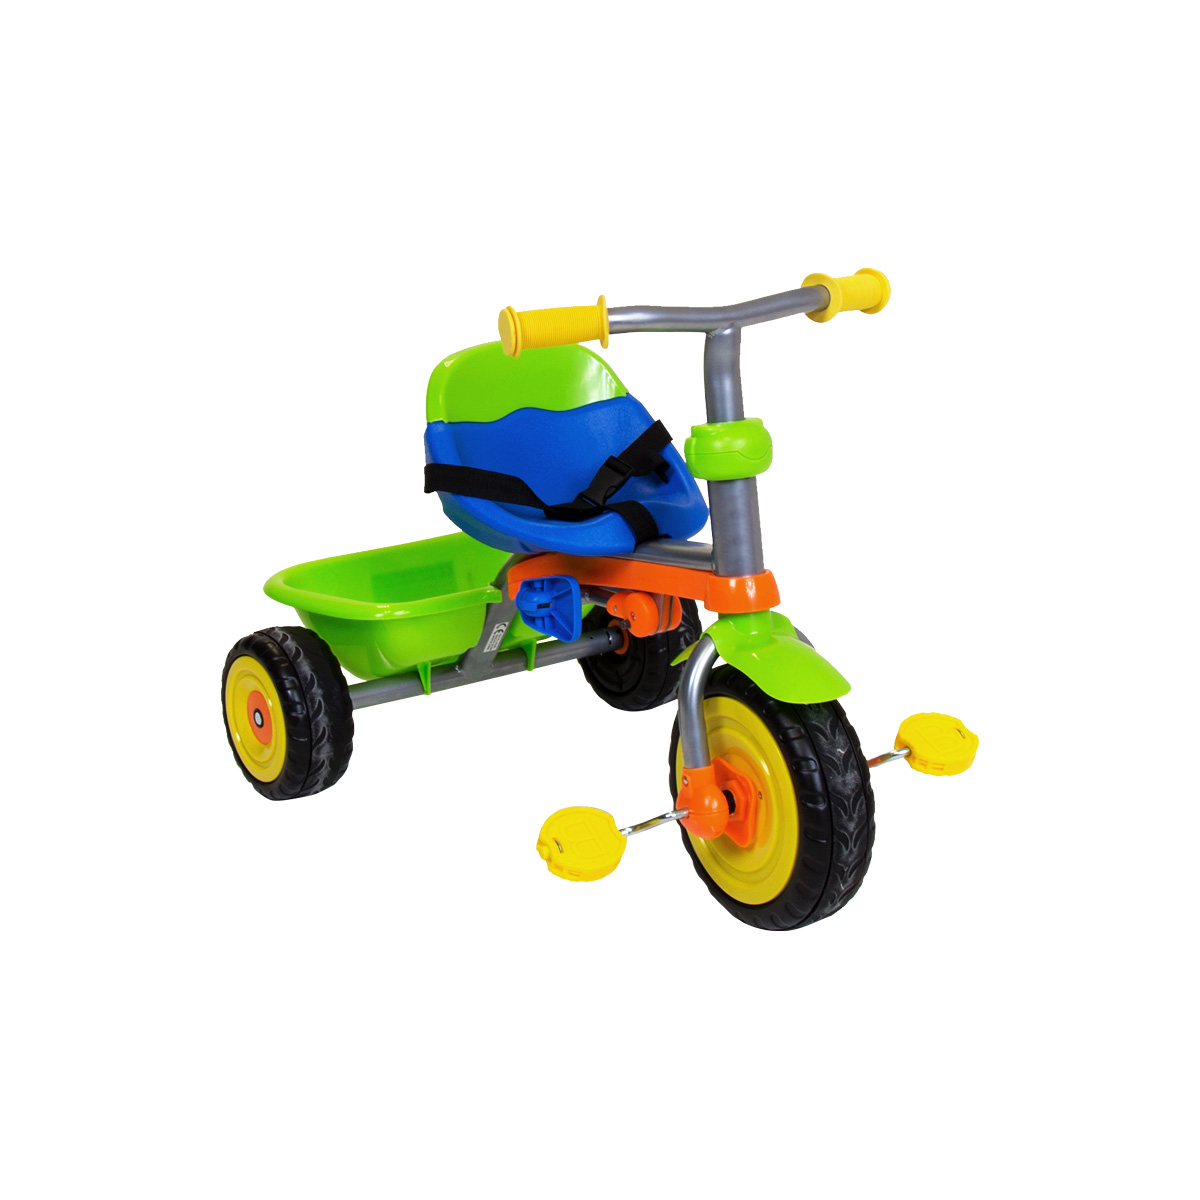 Trikestar Children\'s 4 in 1 Kids Trike Bike Tricycle 3 Wheel With ...